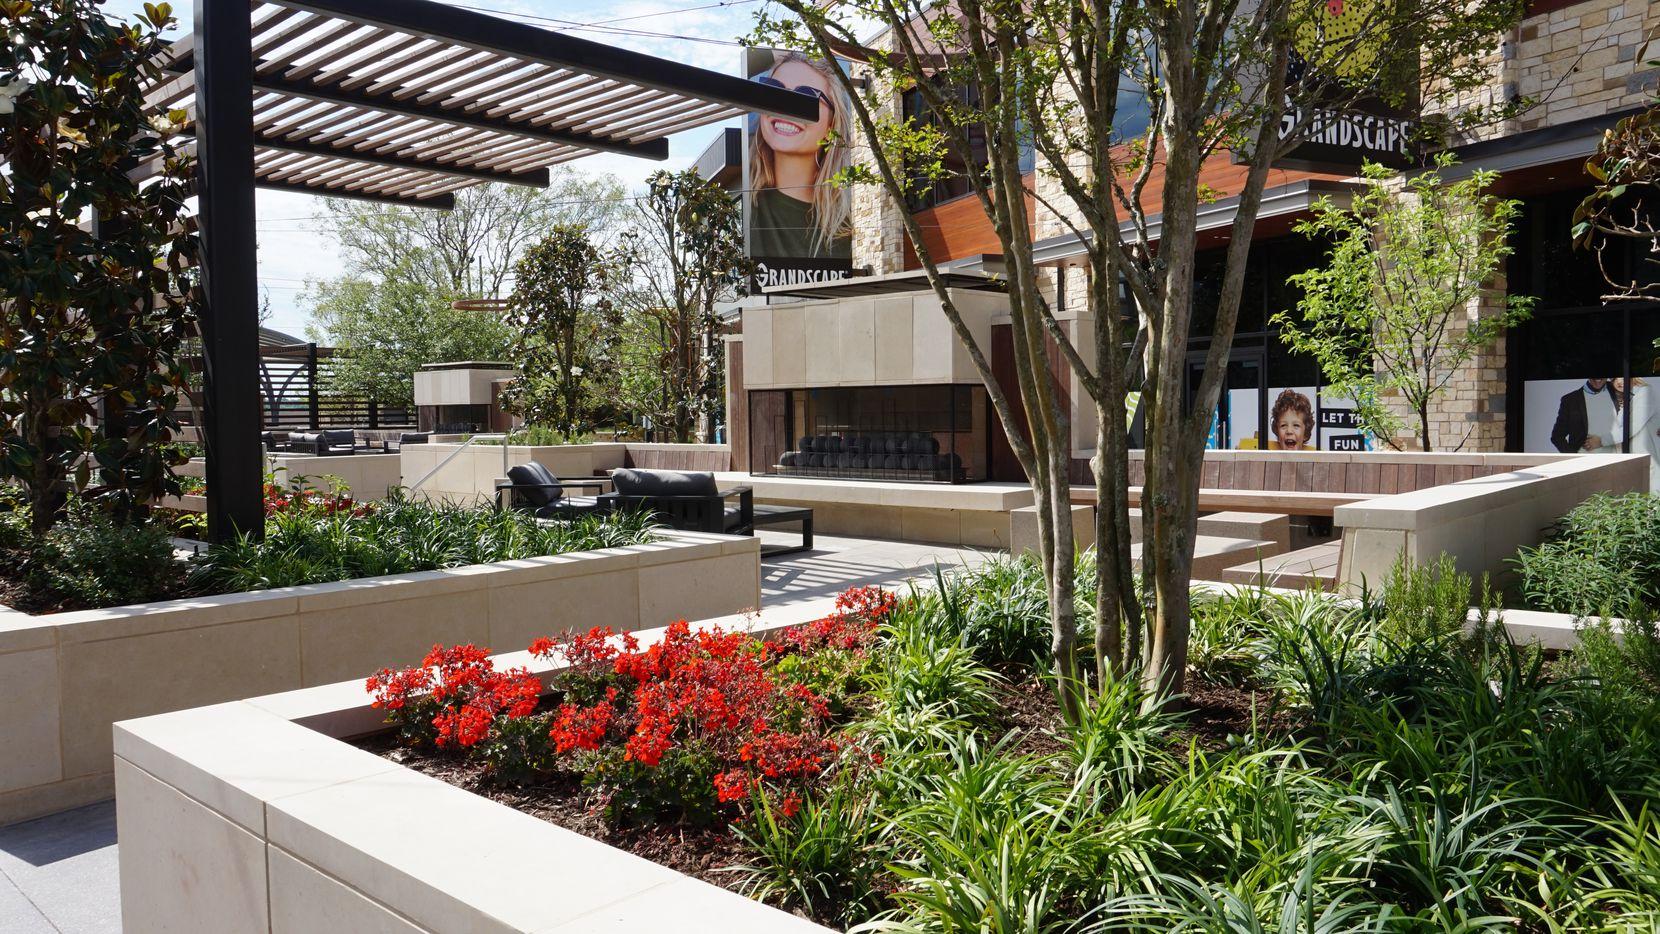 Grandscape is a new development in The Colony next to Nebraska Furniture Mart.